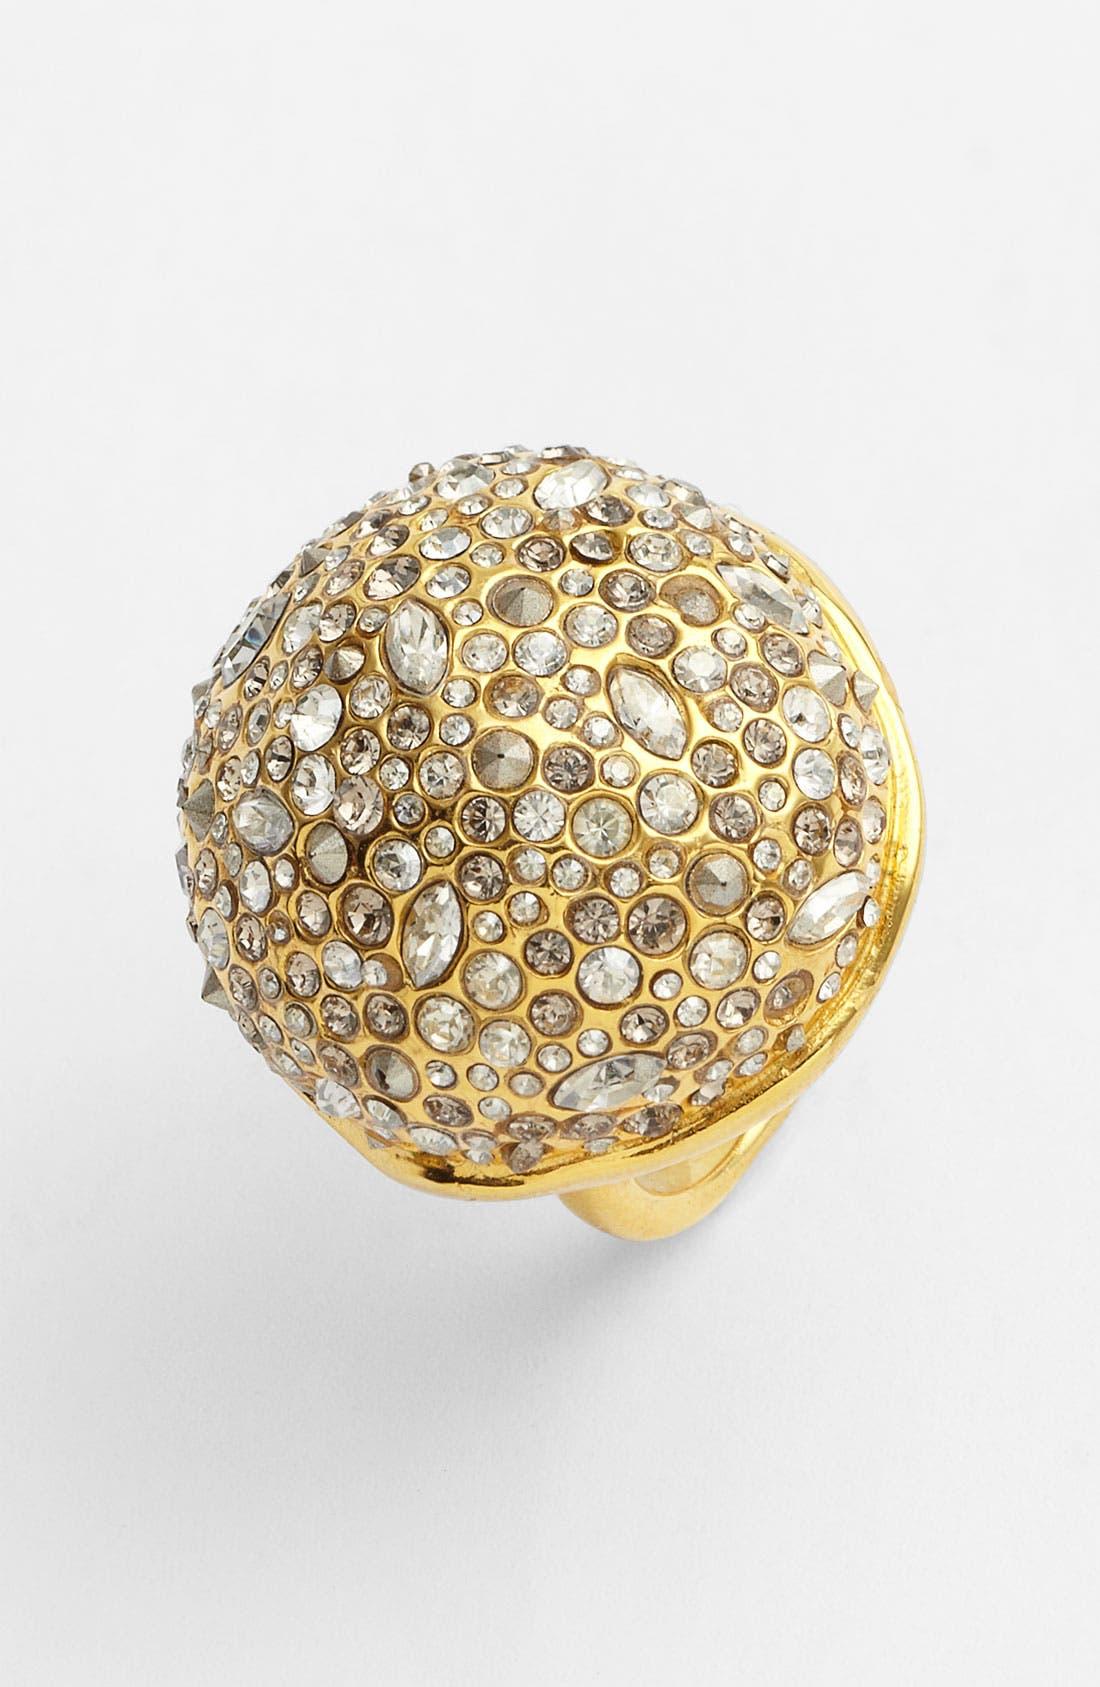 Alternate Image 1 Selected - Alexis Bittar 'Miss Havisham' Crystal Encrusted Sphere Ring